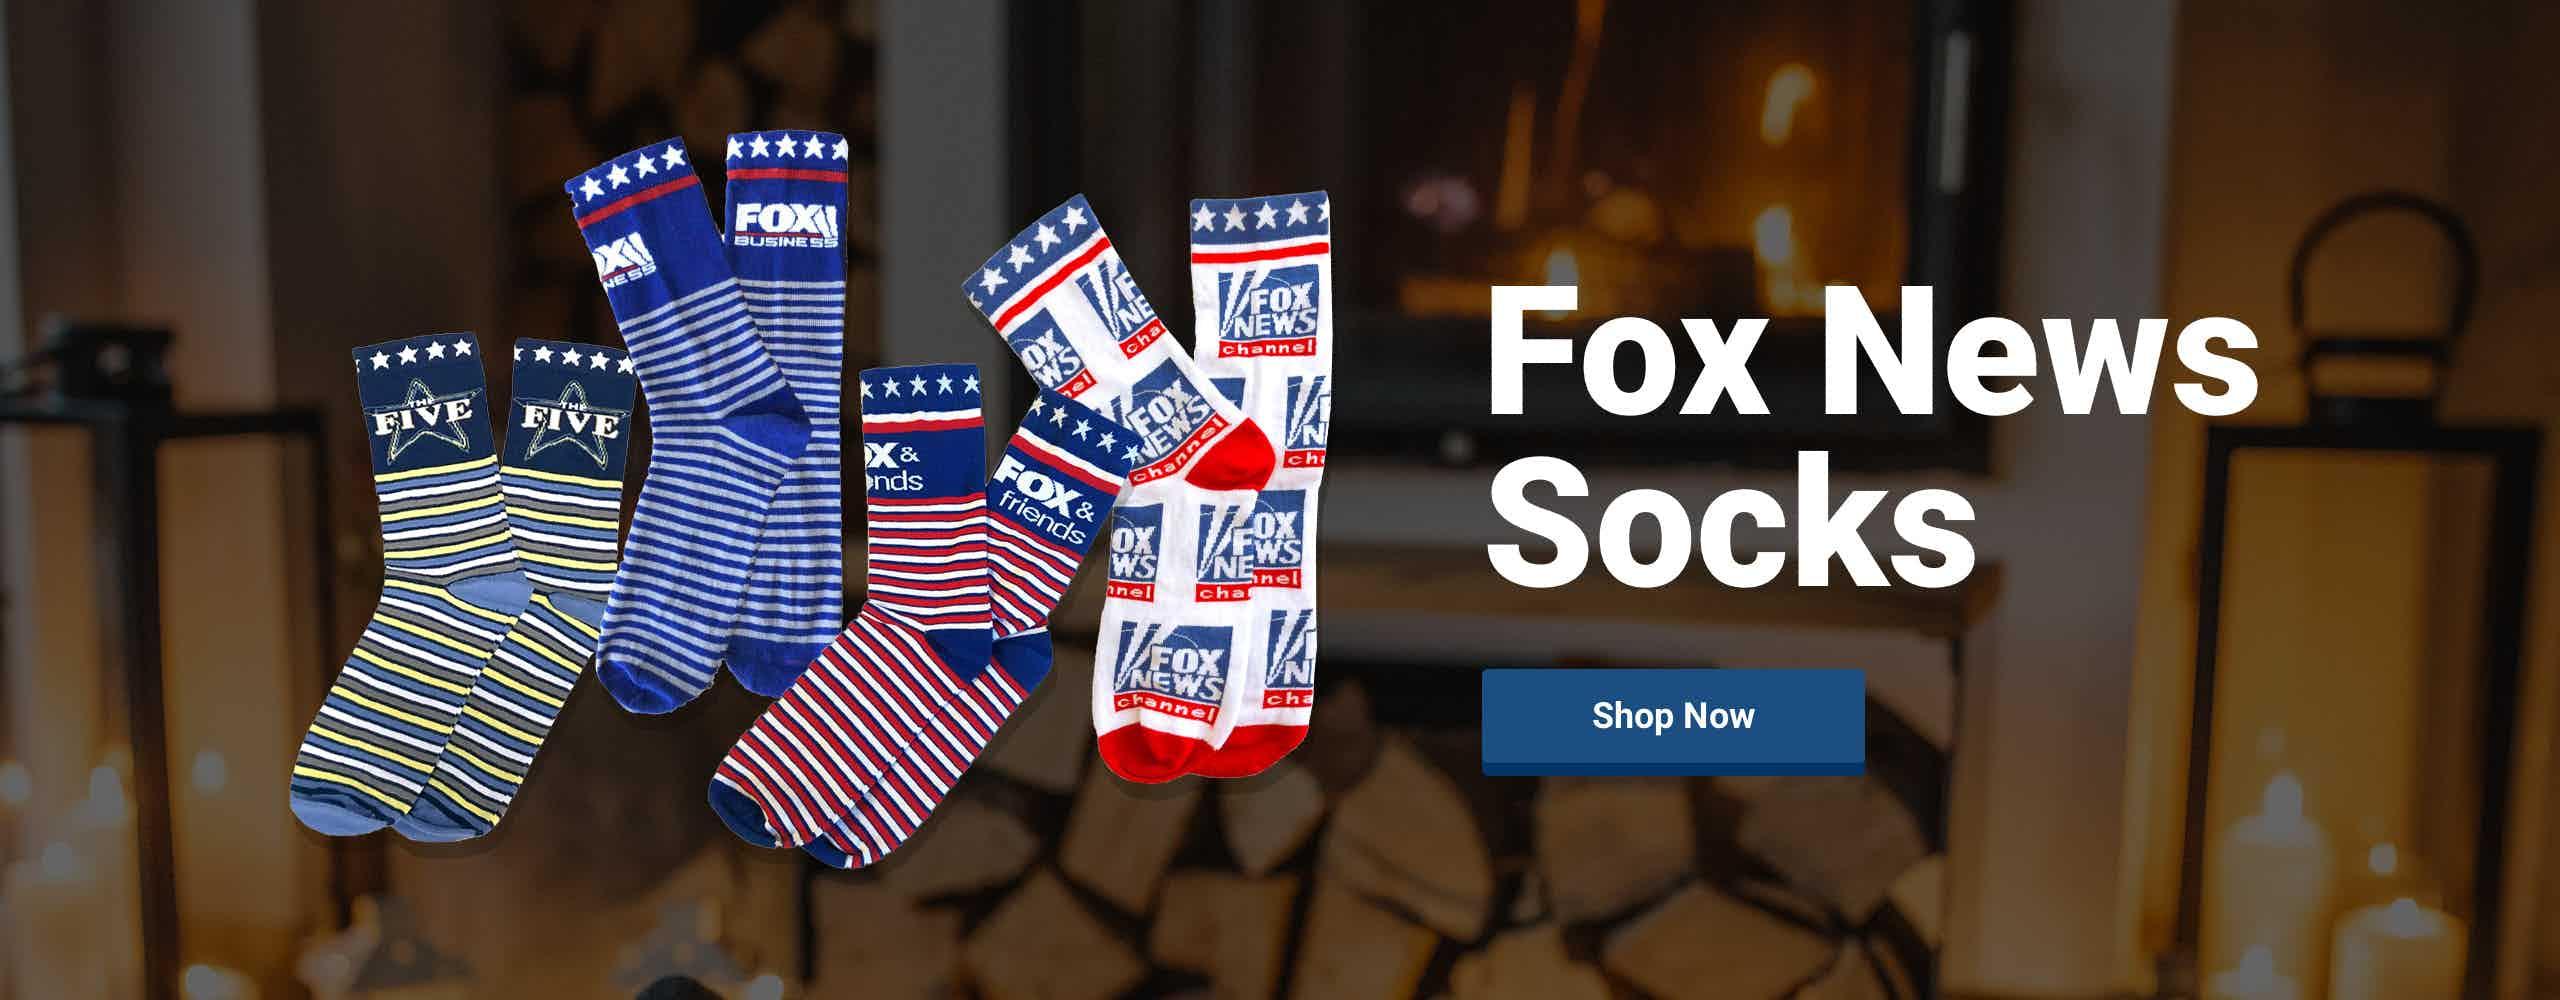 Fox News Socks